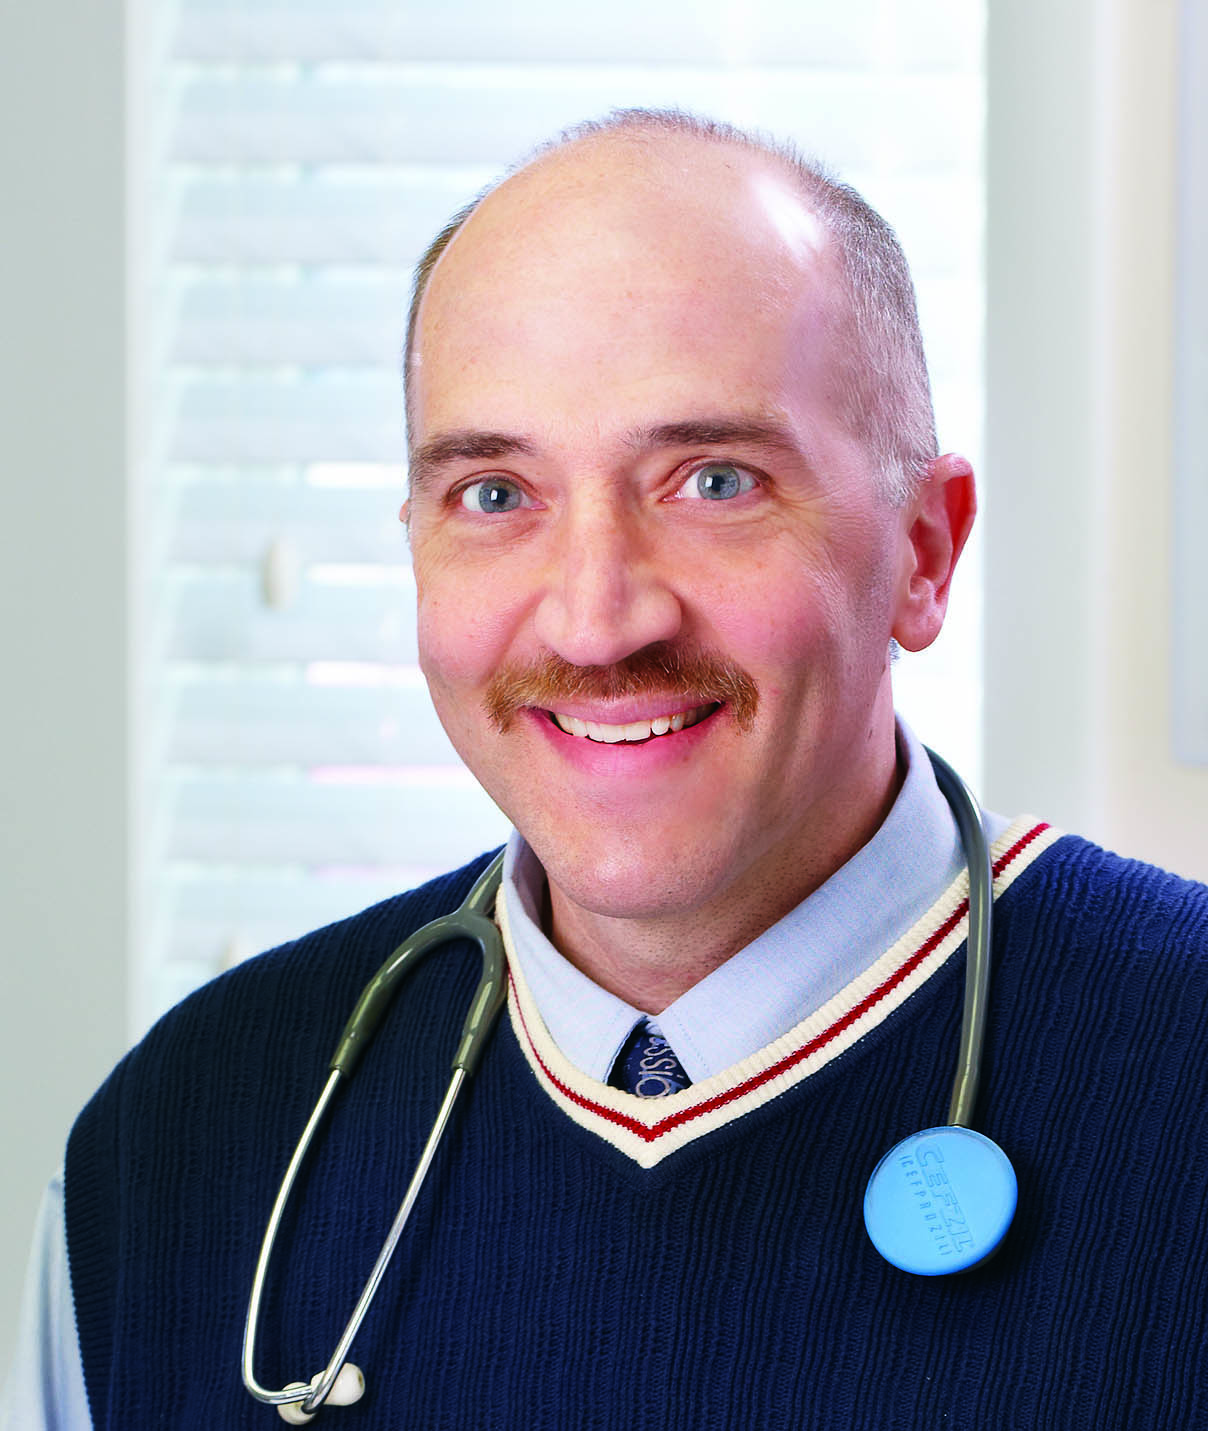 David Huff, DO - An Employed Provider of Memorial Healthcare